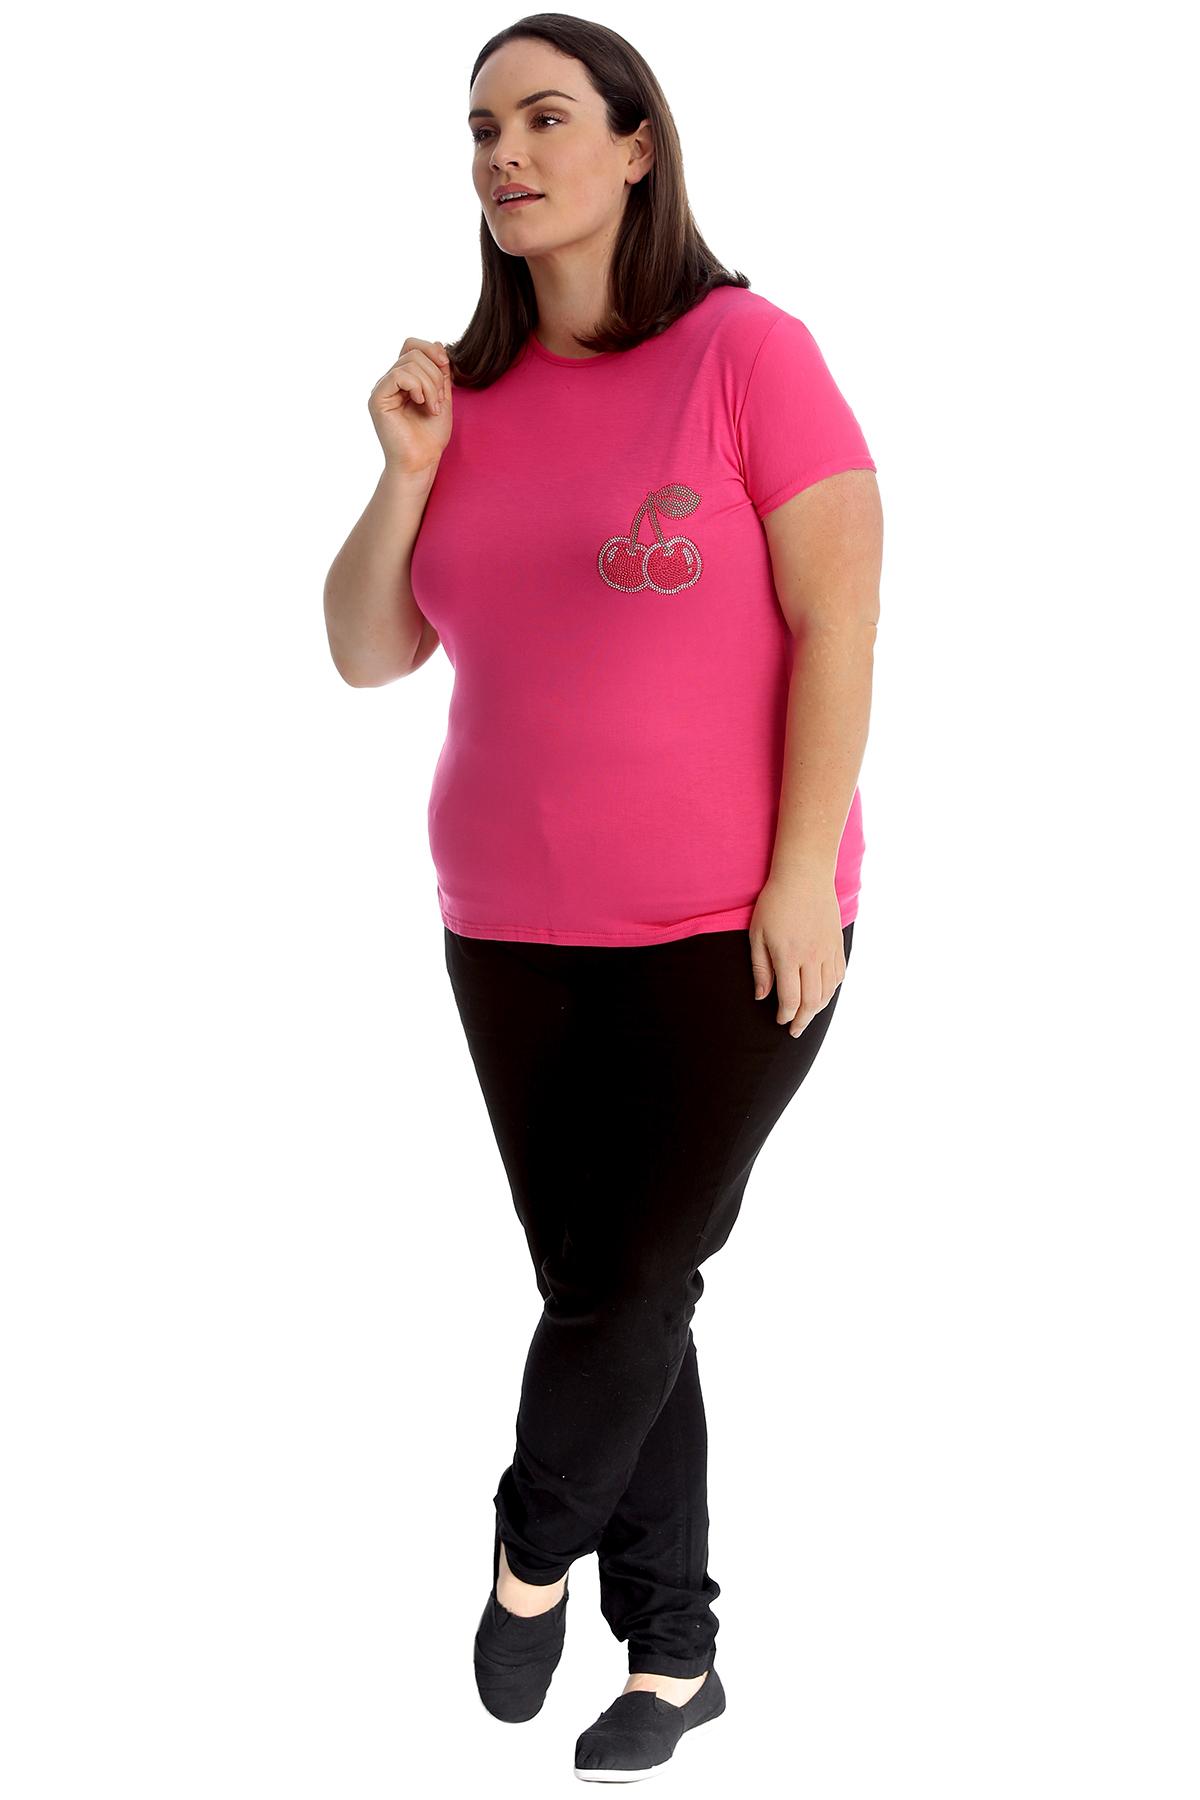 New-Womens-Plus-Size-Top-Ladies-Cherry-Rhinestone-T-Shirt-Soft-Stud-Shiny-Hip thumbnail 20